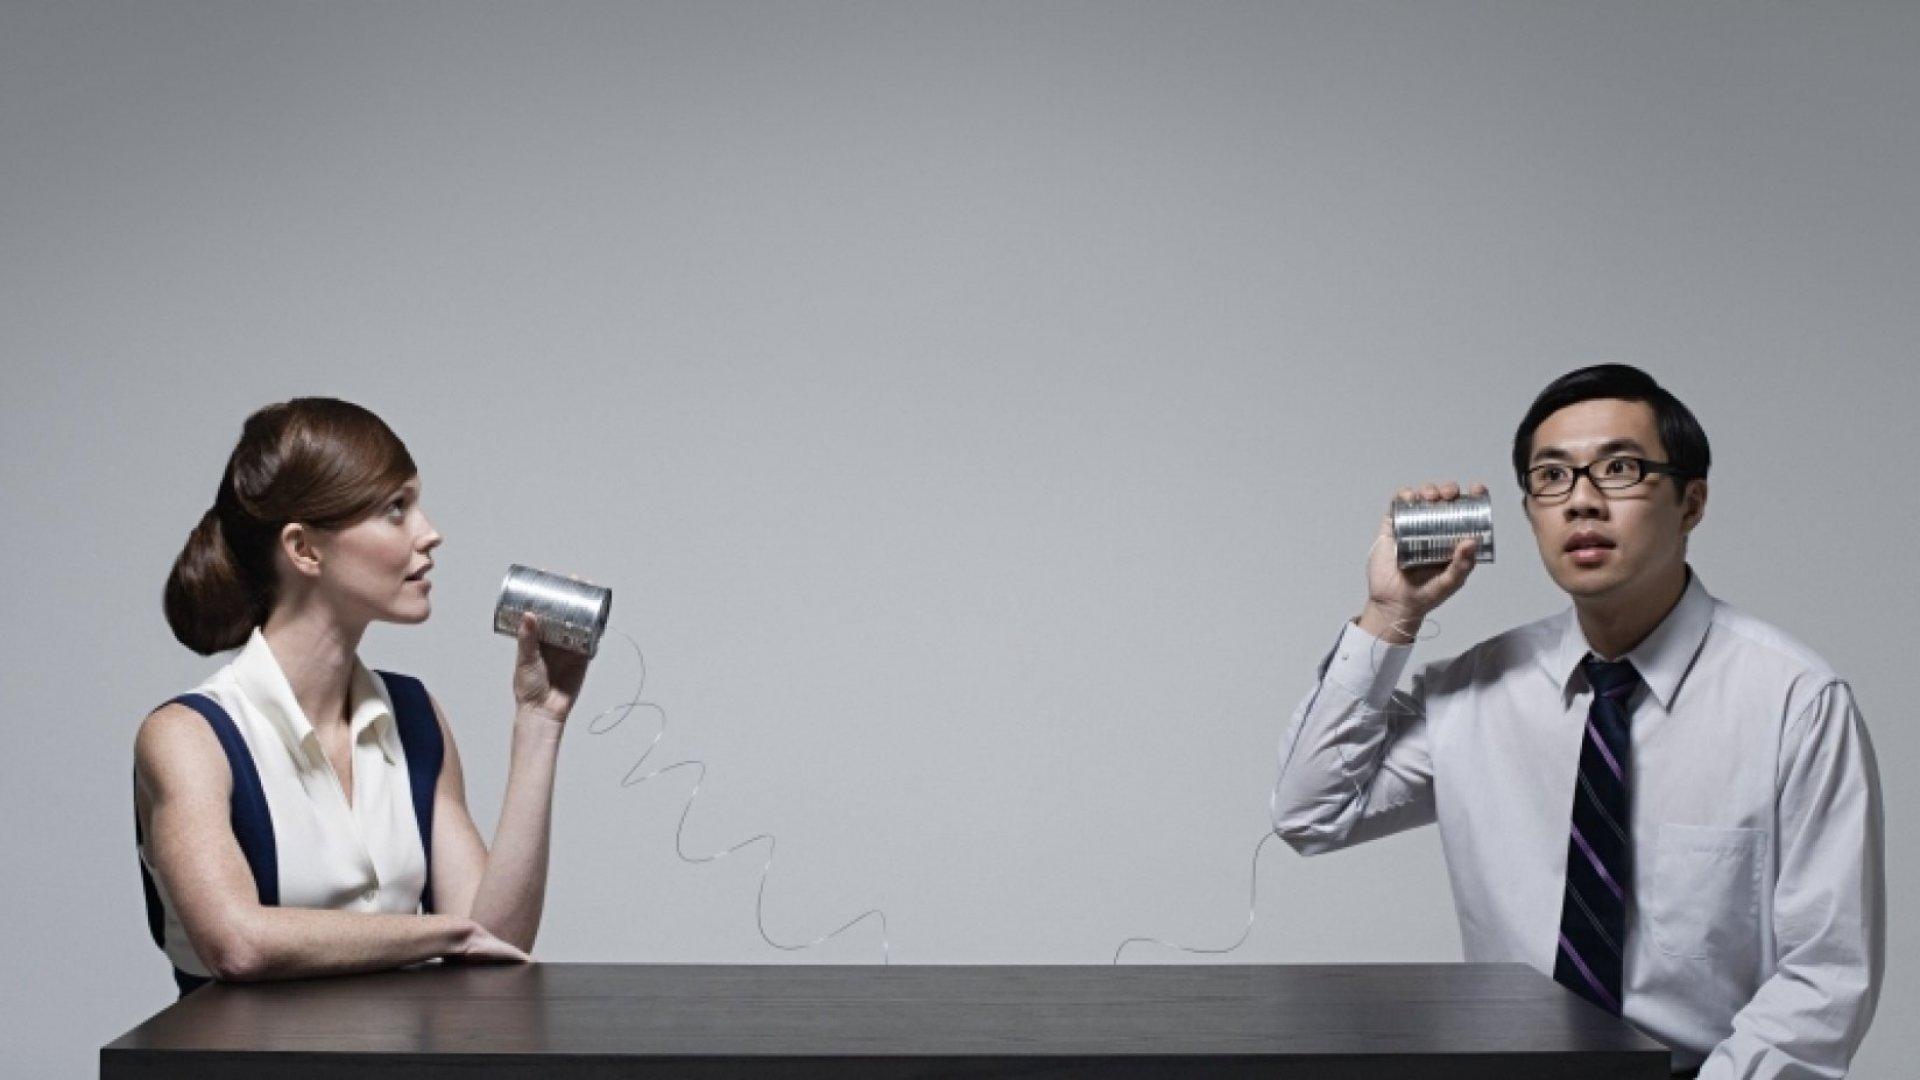 How to Bridge the Millennial/Baby Boomer Communication Gap